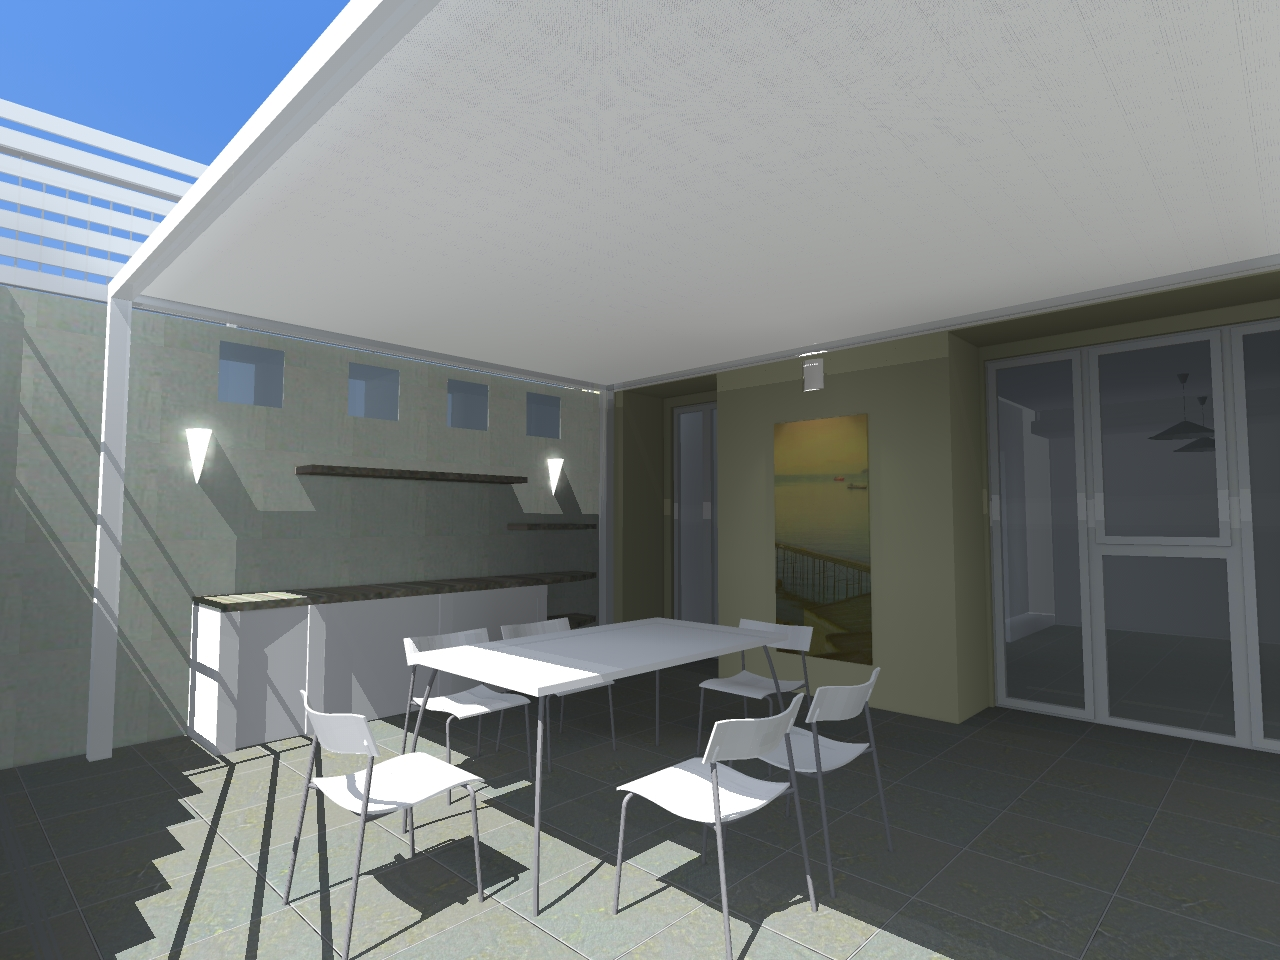 Miro casa appartamento con giardino rendering for Rendering giardino